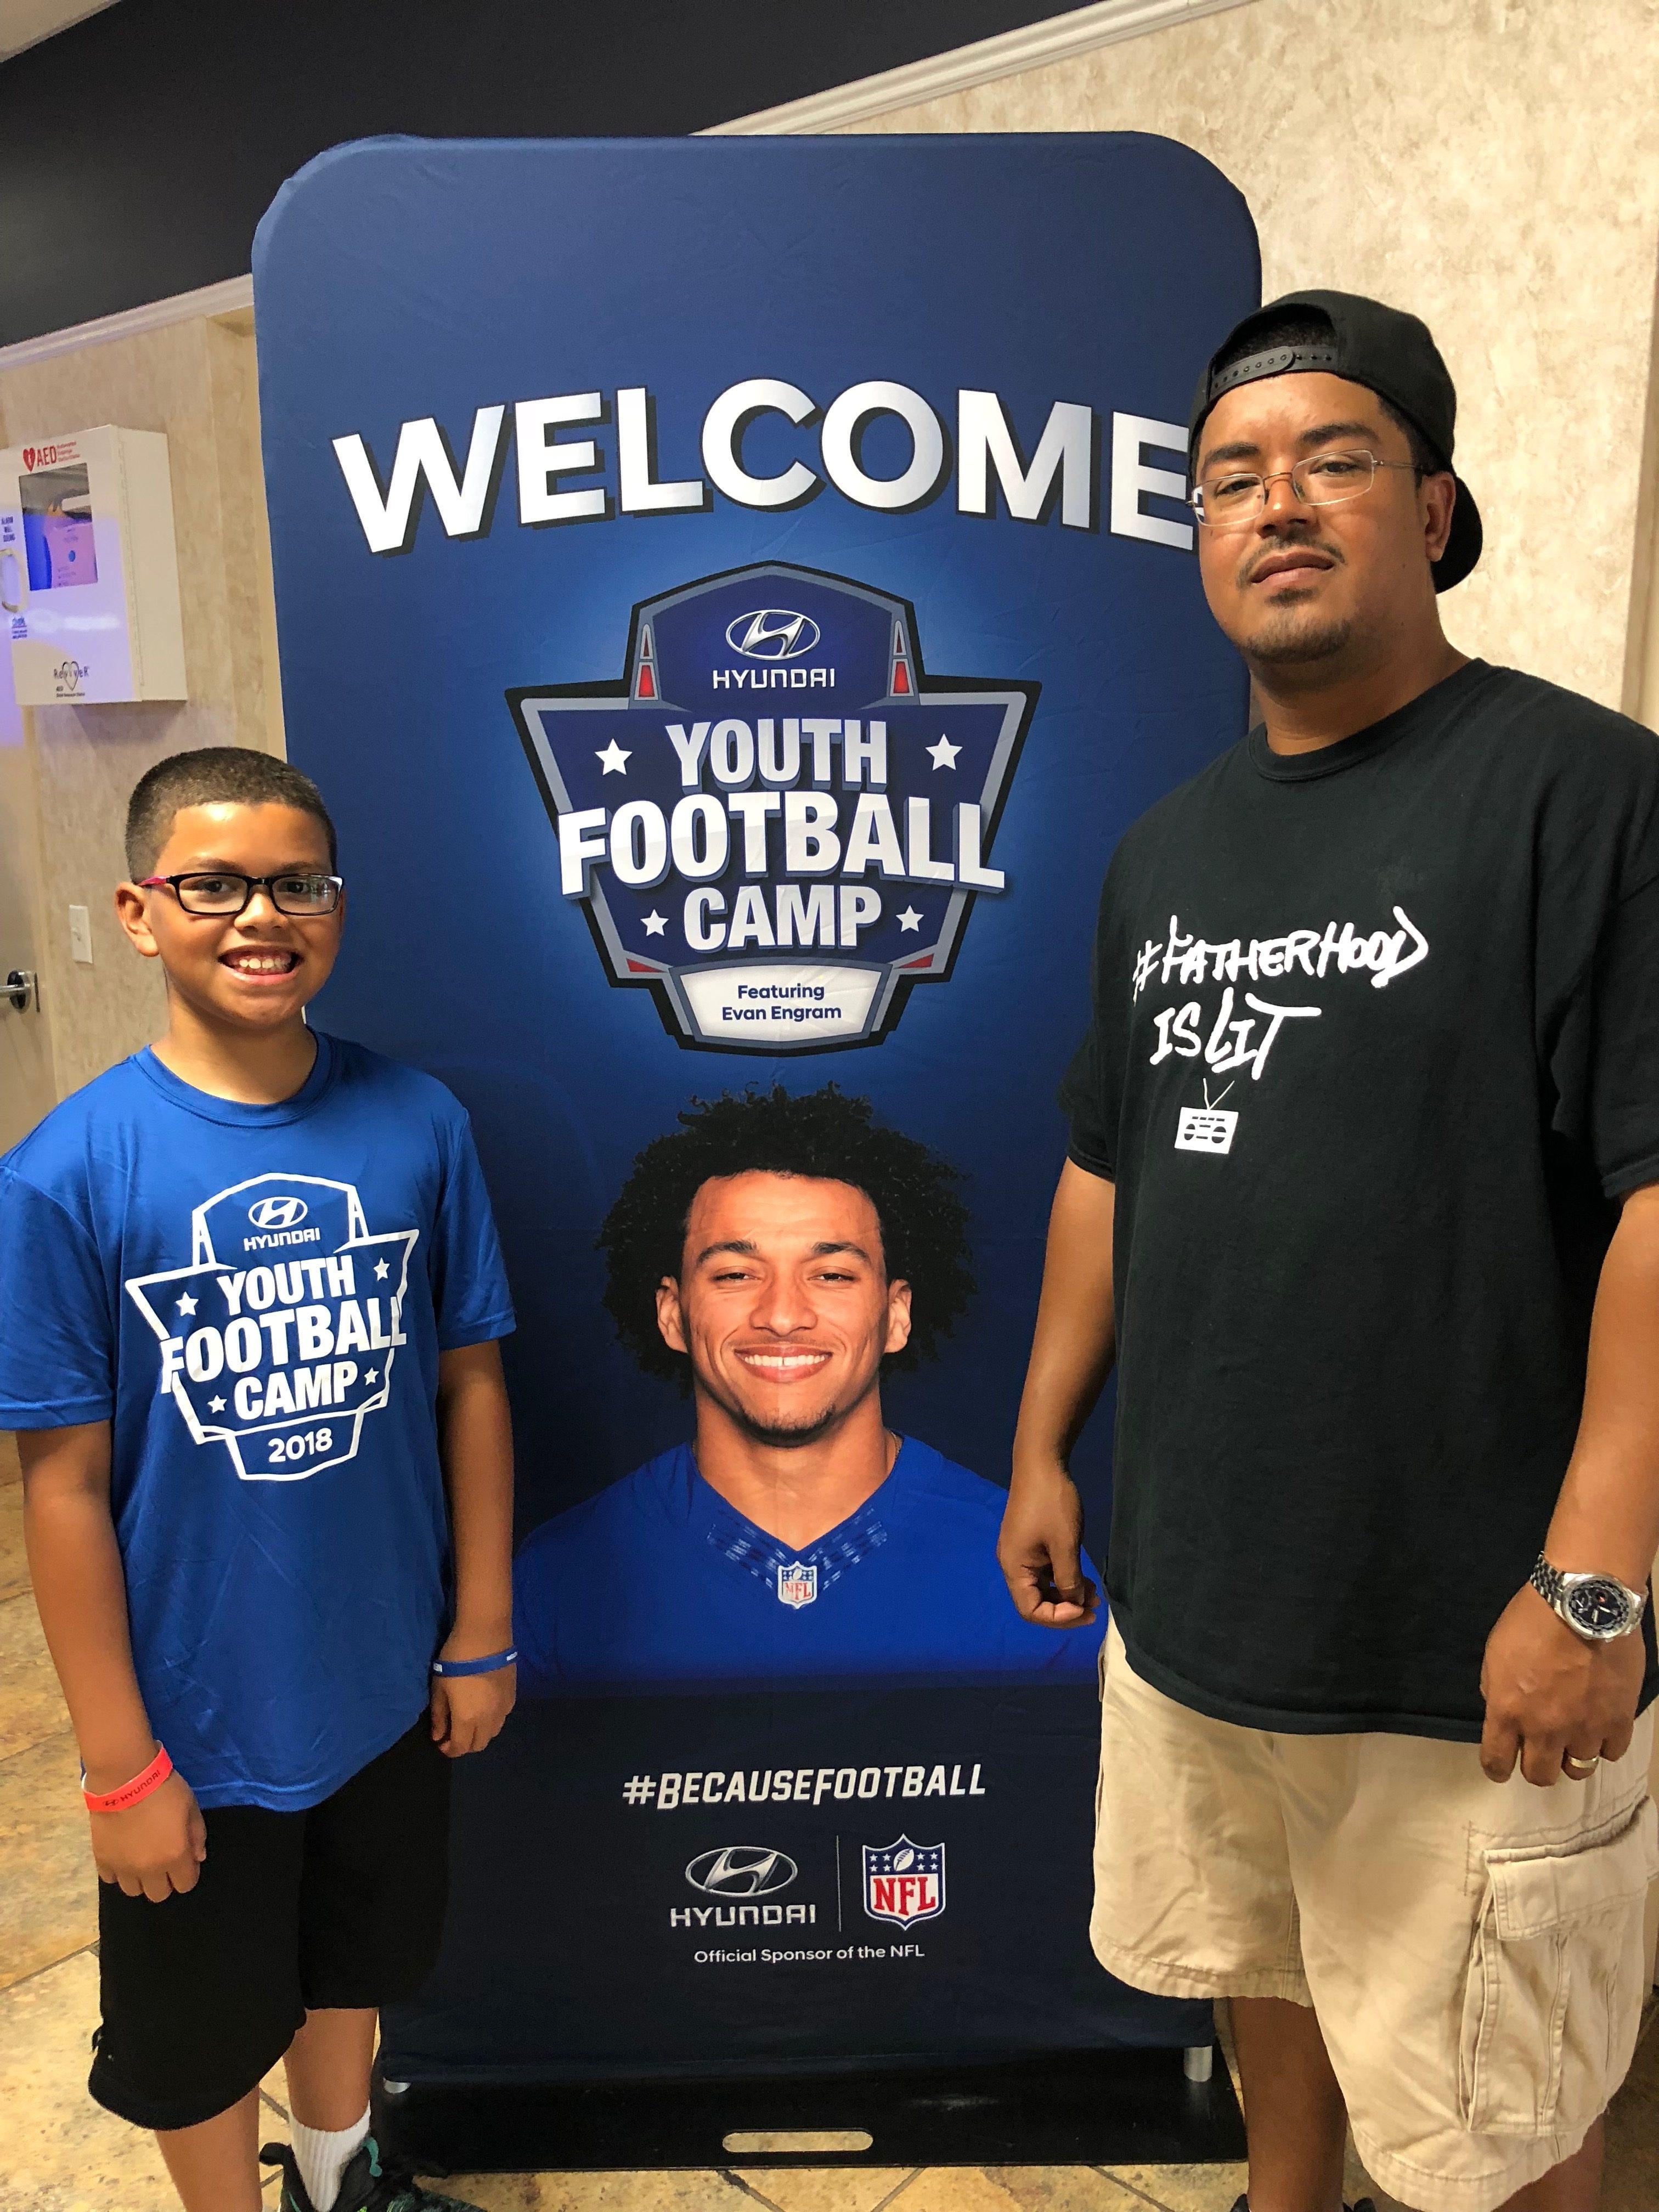 Introduce your kids to new sports #FatherhoodIsLit Hyundai Foot Ball Camp